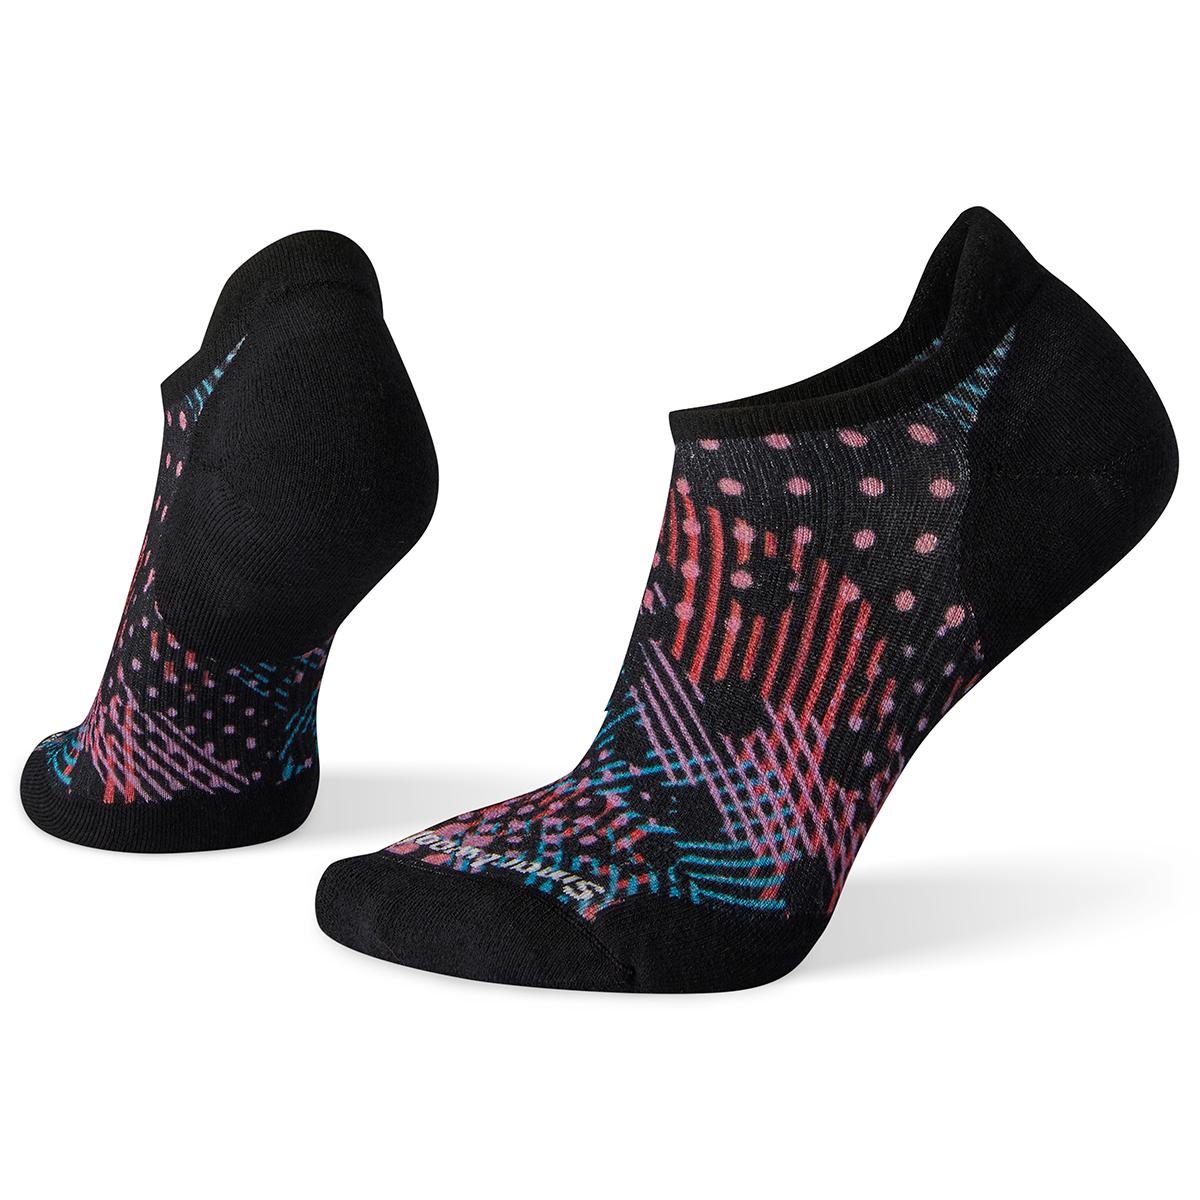 Smartwool Women's Phd Run Elite Dot Print Micro Socks - Black, L